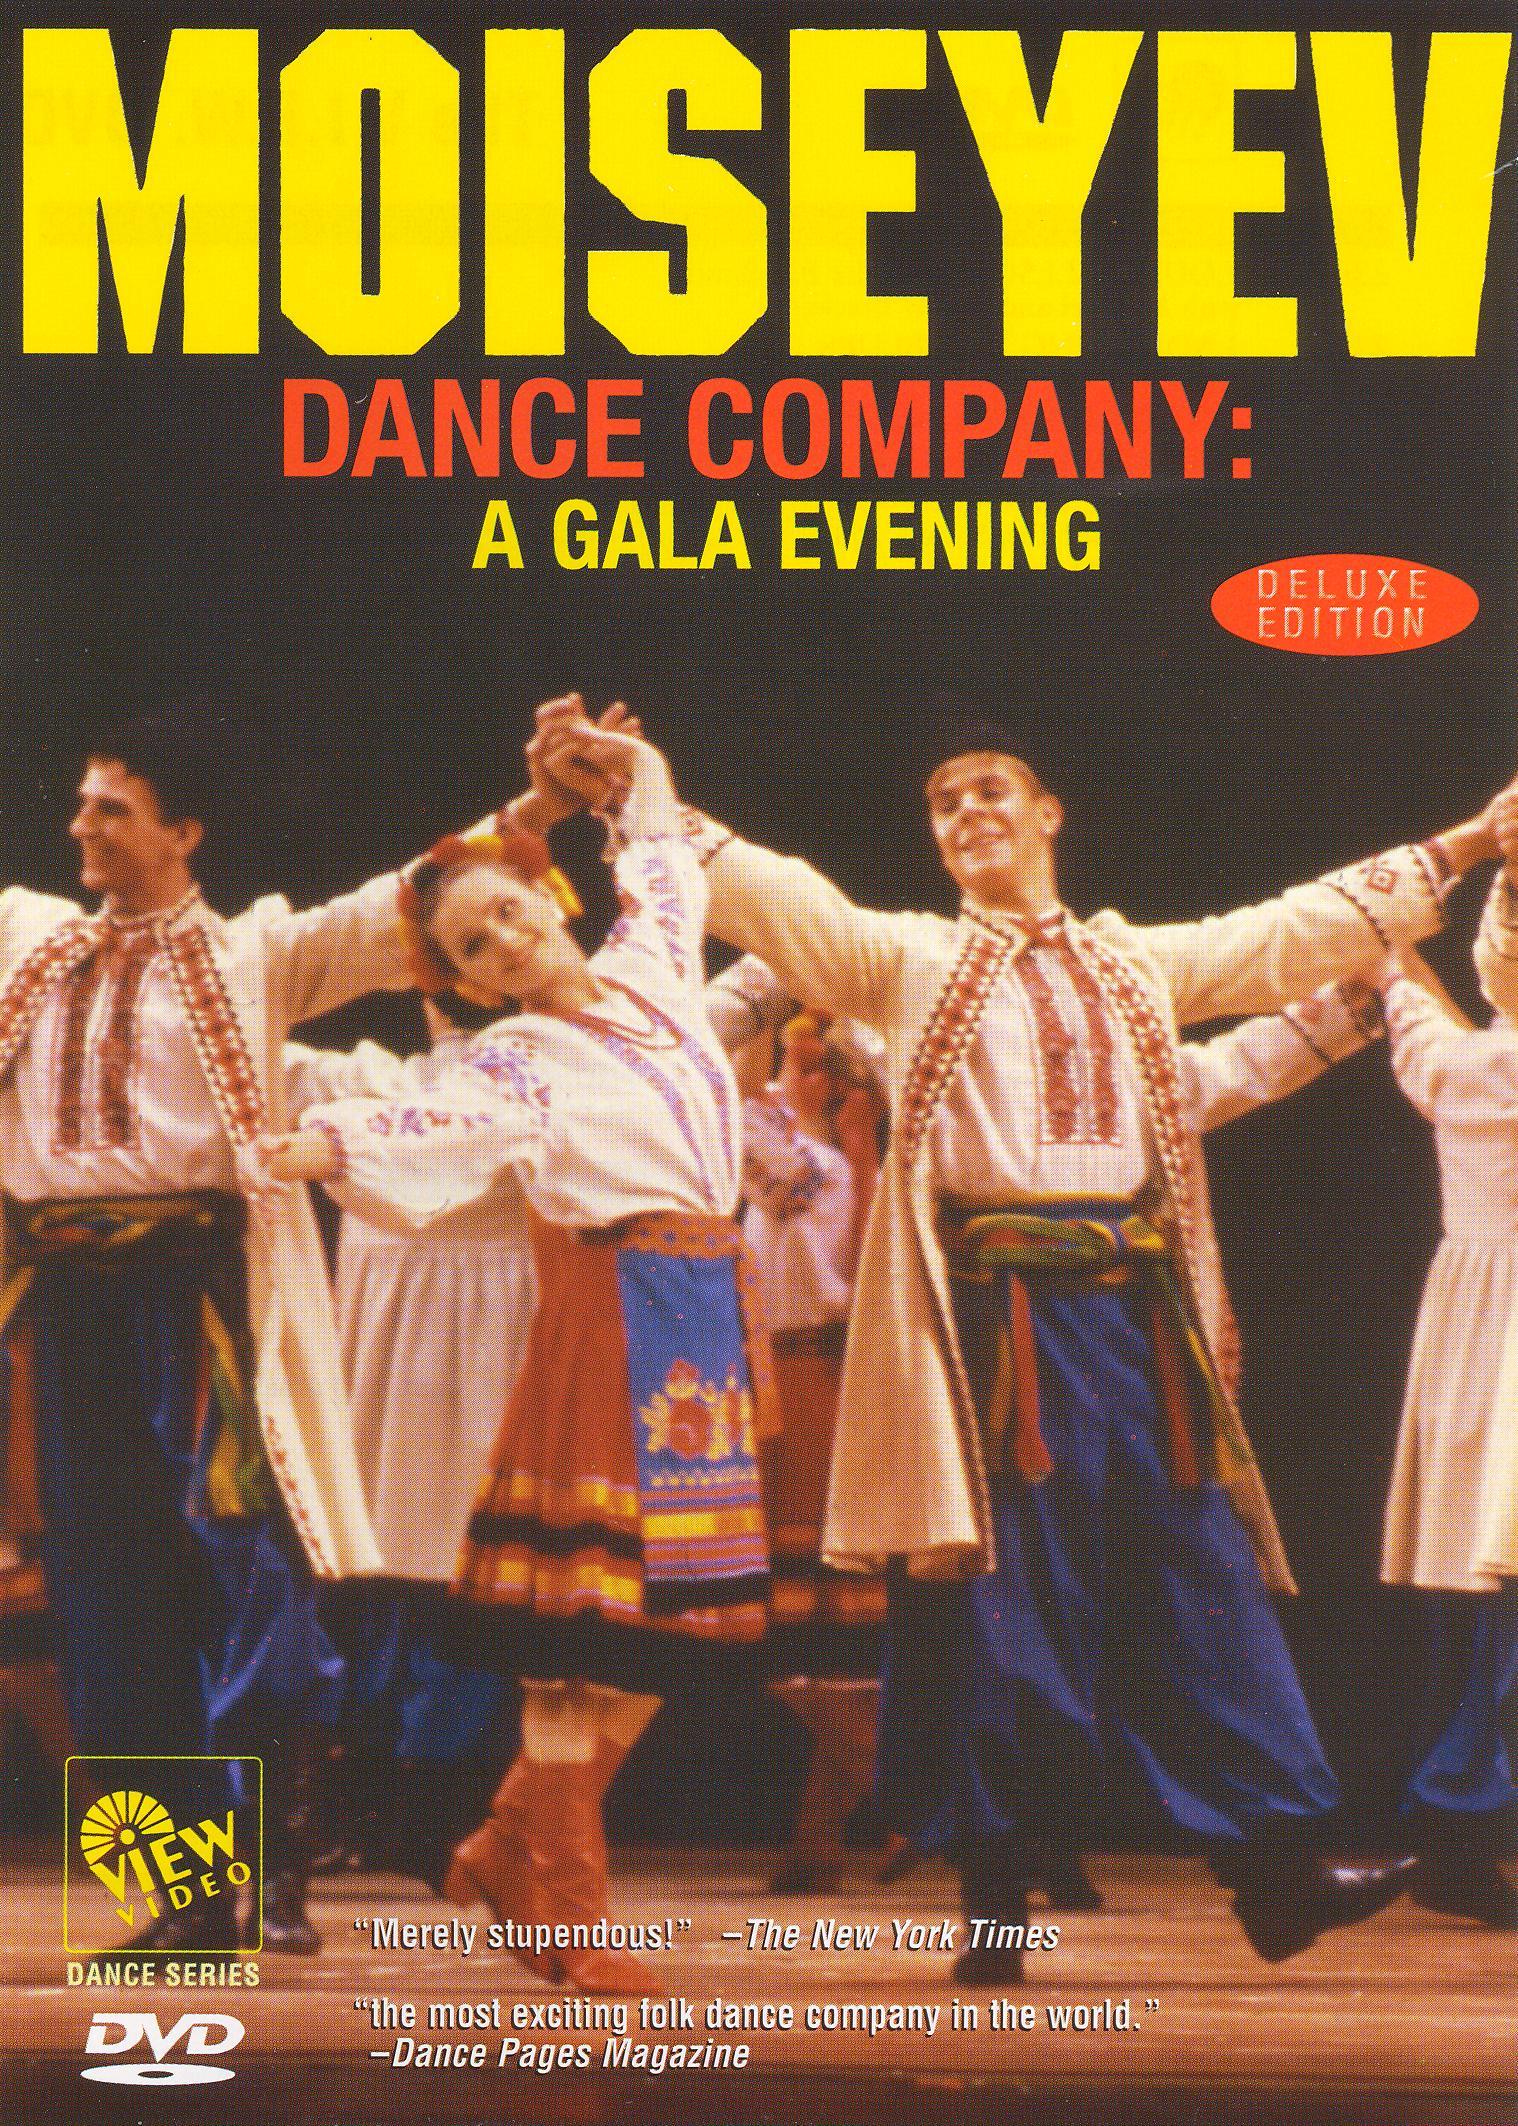 Moiseyev Dance Company: A Gala Evening